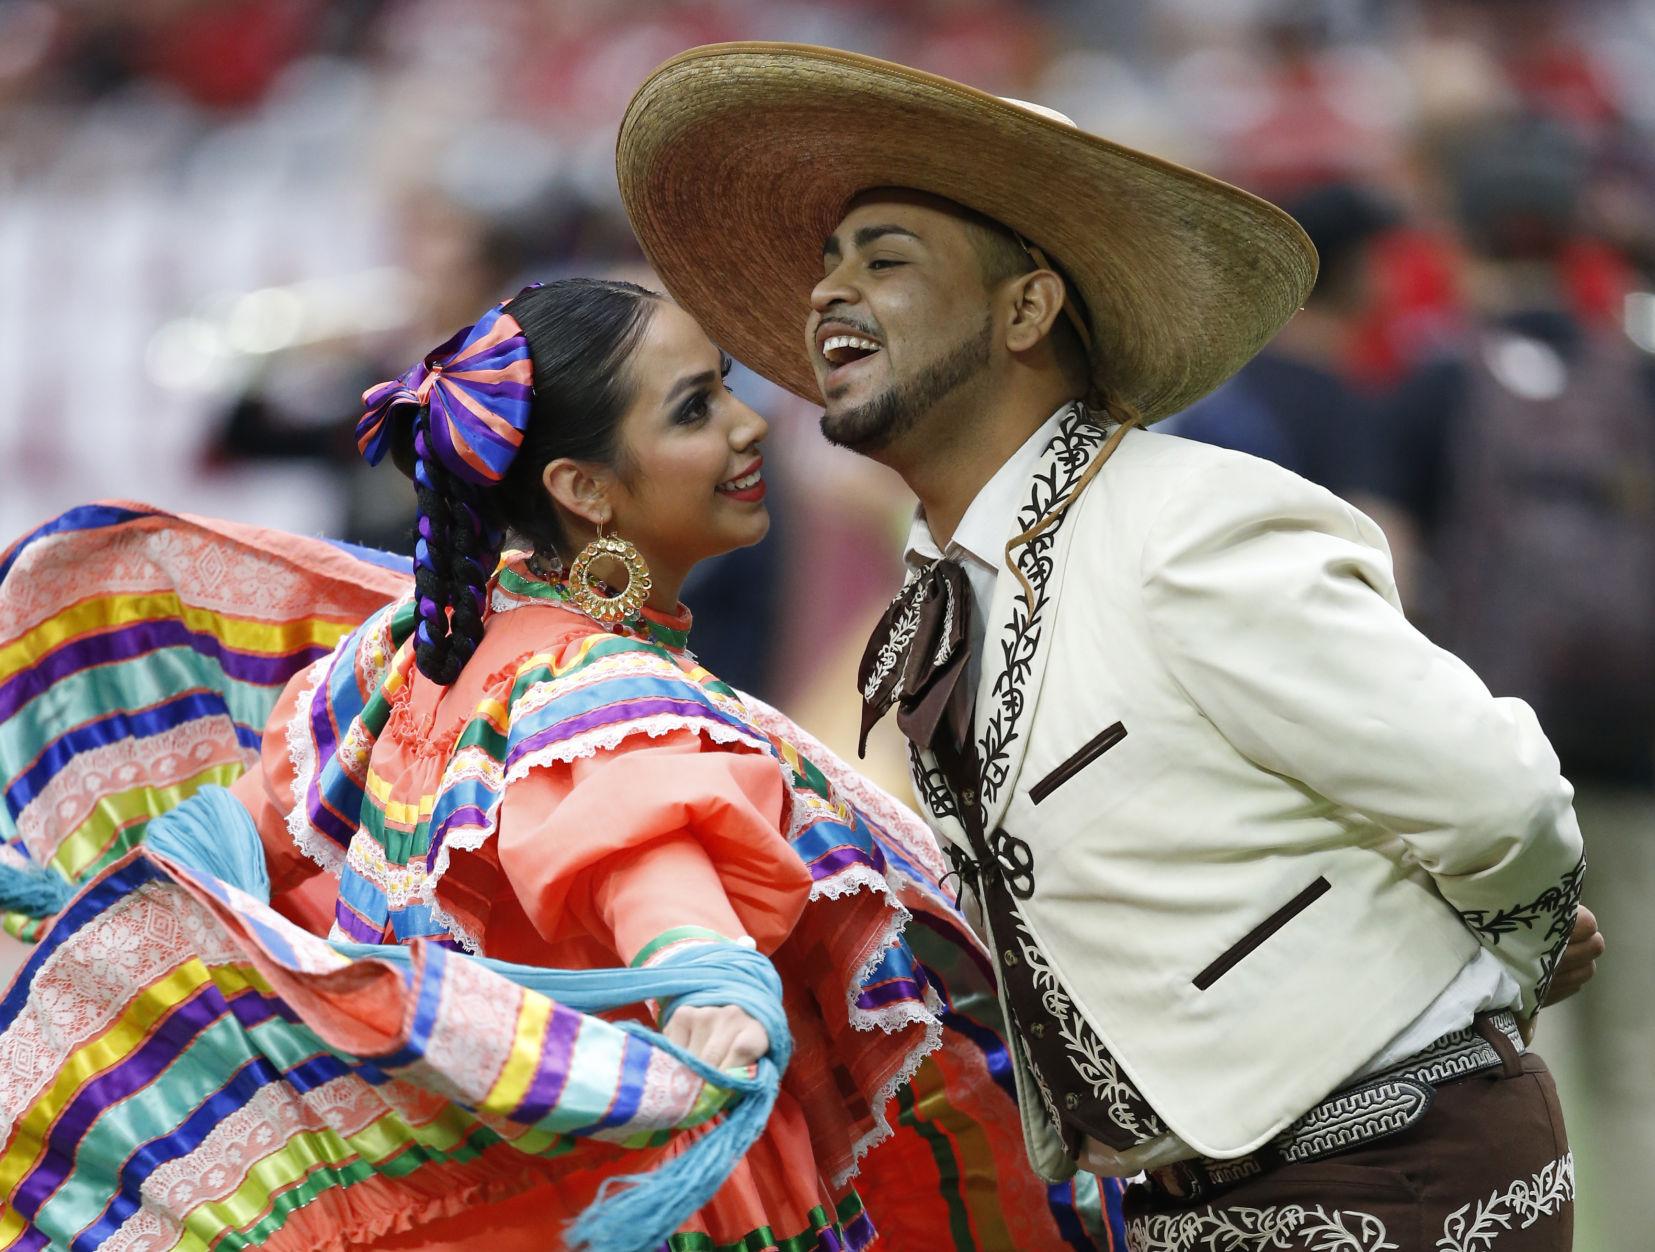 Celebrate Hispanic Heritage Month with NBC4